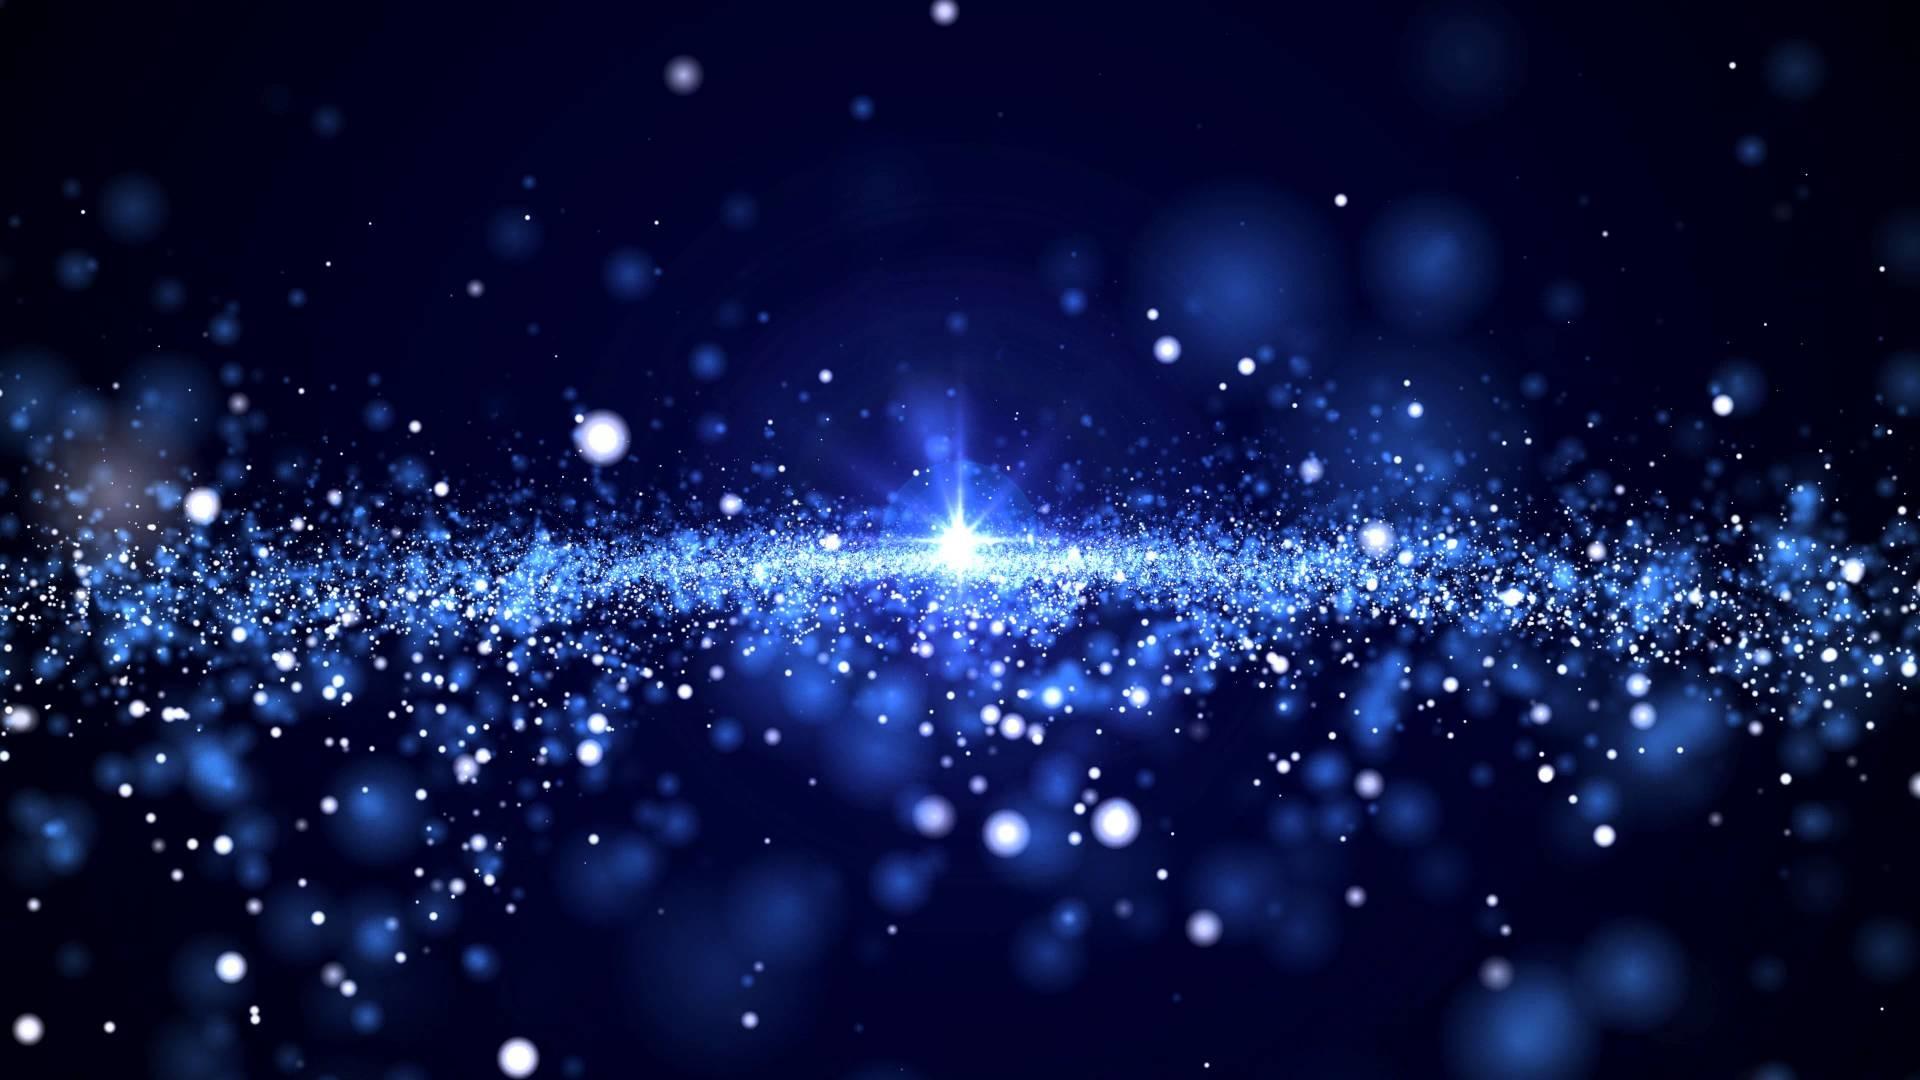 8K Moving Background 4320p Popular Blue Neblua Remake Space Travel – YouTube